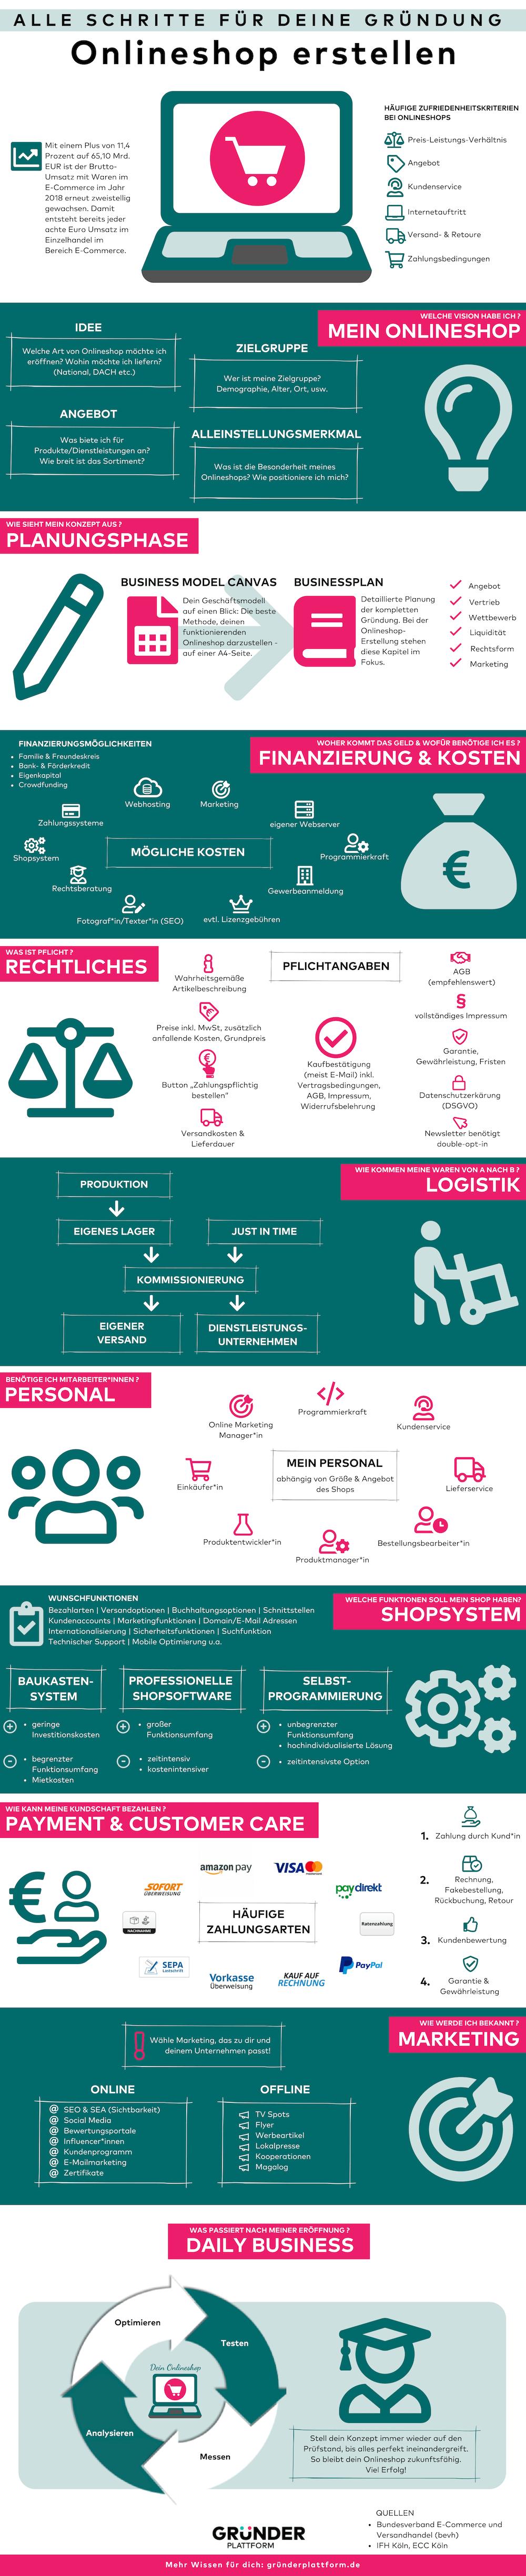 Infografik Onlineshop erstellen (Bild: Gründerplattform)